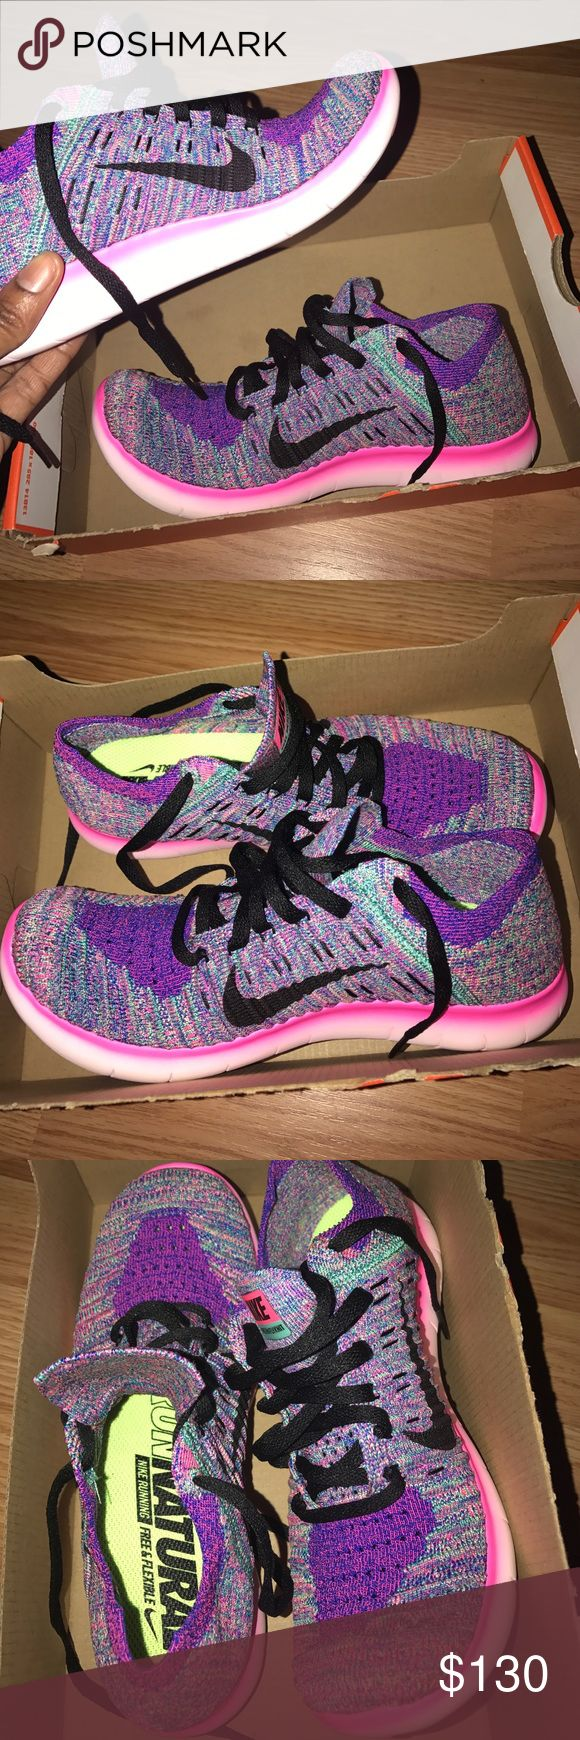 NIKE FREE RUN FLYKNIT (BNIB) 💕🎉⭐️beautiful🌹💅🏽💍 Authentic size 6.5 women! Brand new in box. Nike Shoes Sneakers